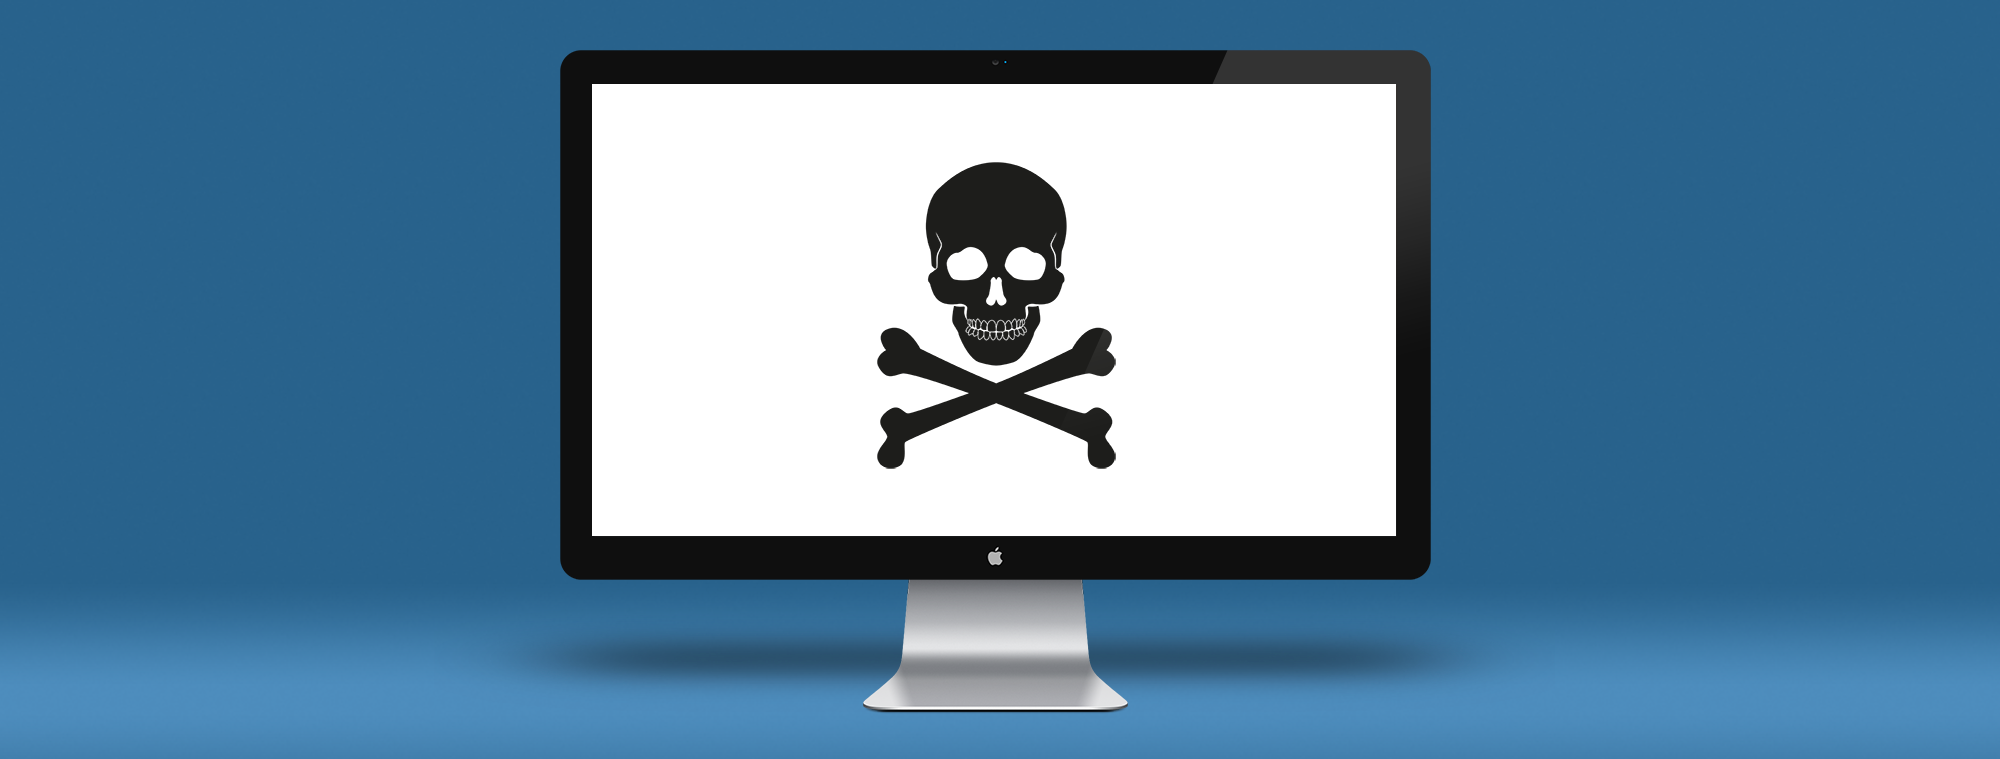 Petya - The new worldwide ransomware attack